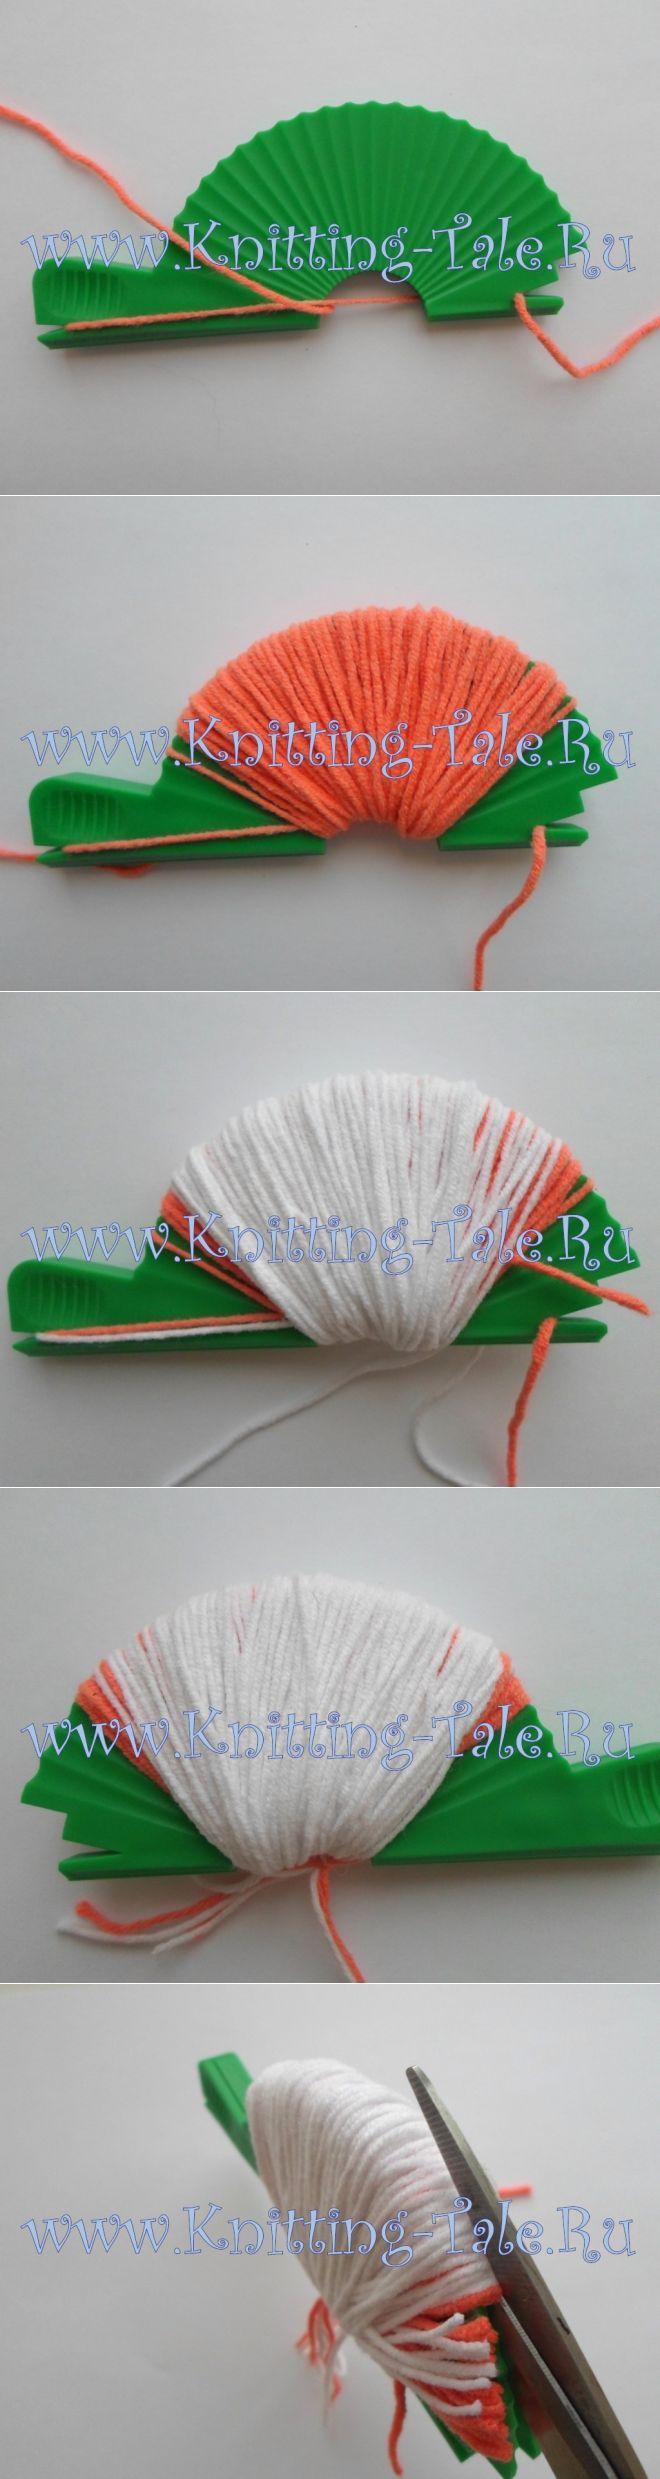 knitting-tale.ru